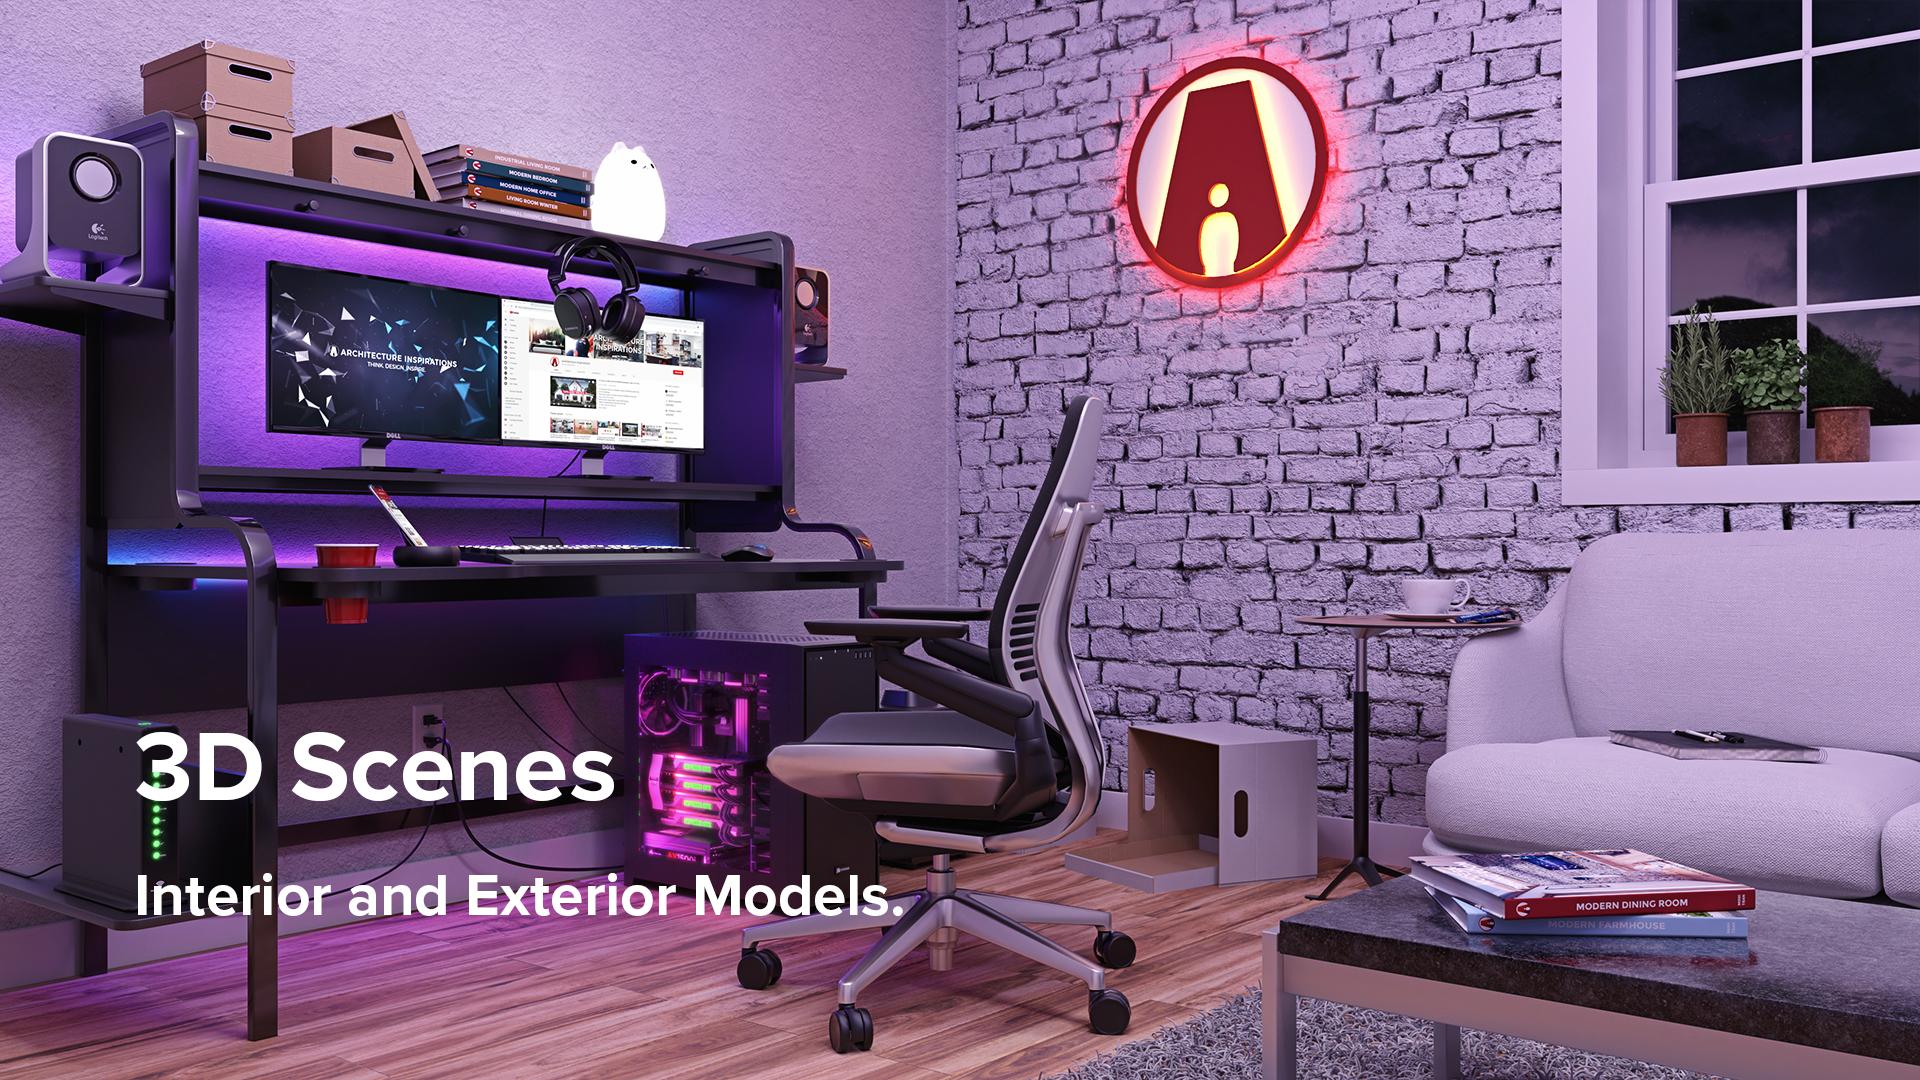 3D Scenes Preview 2.jpg